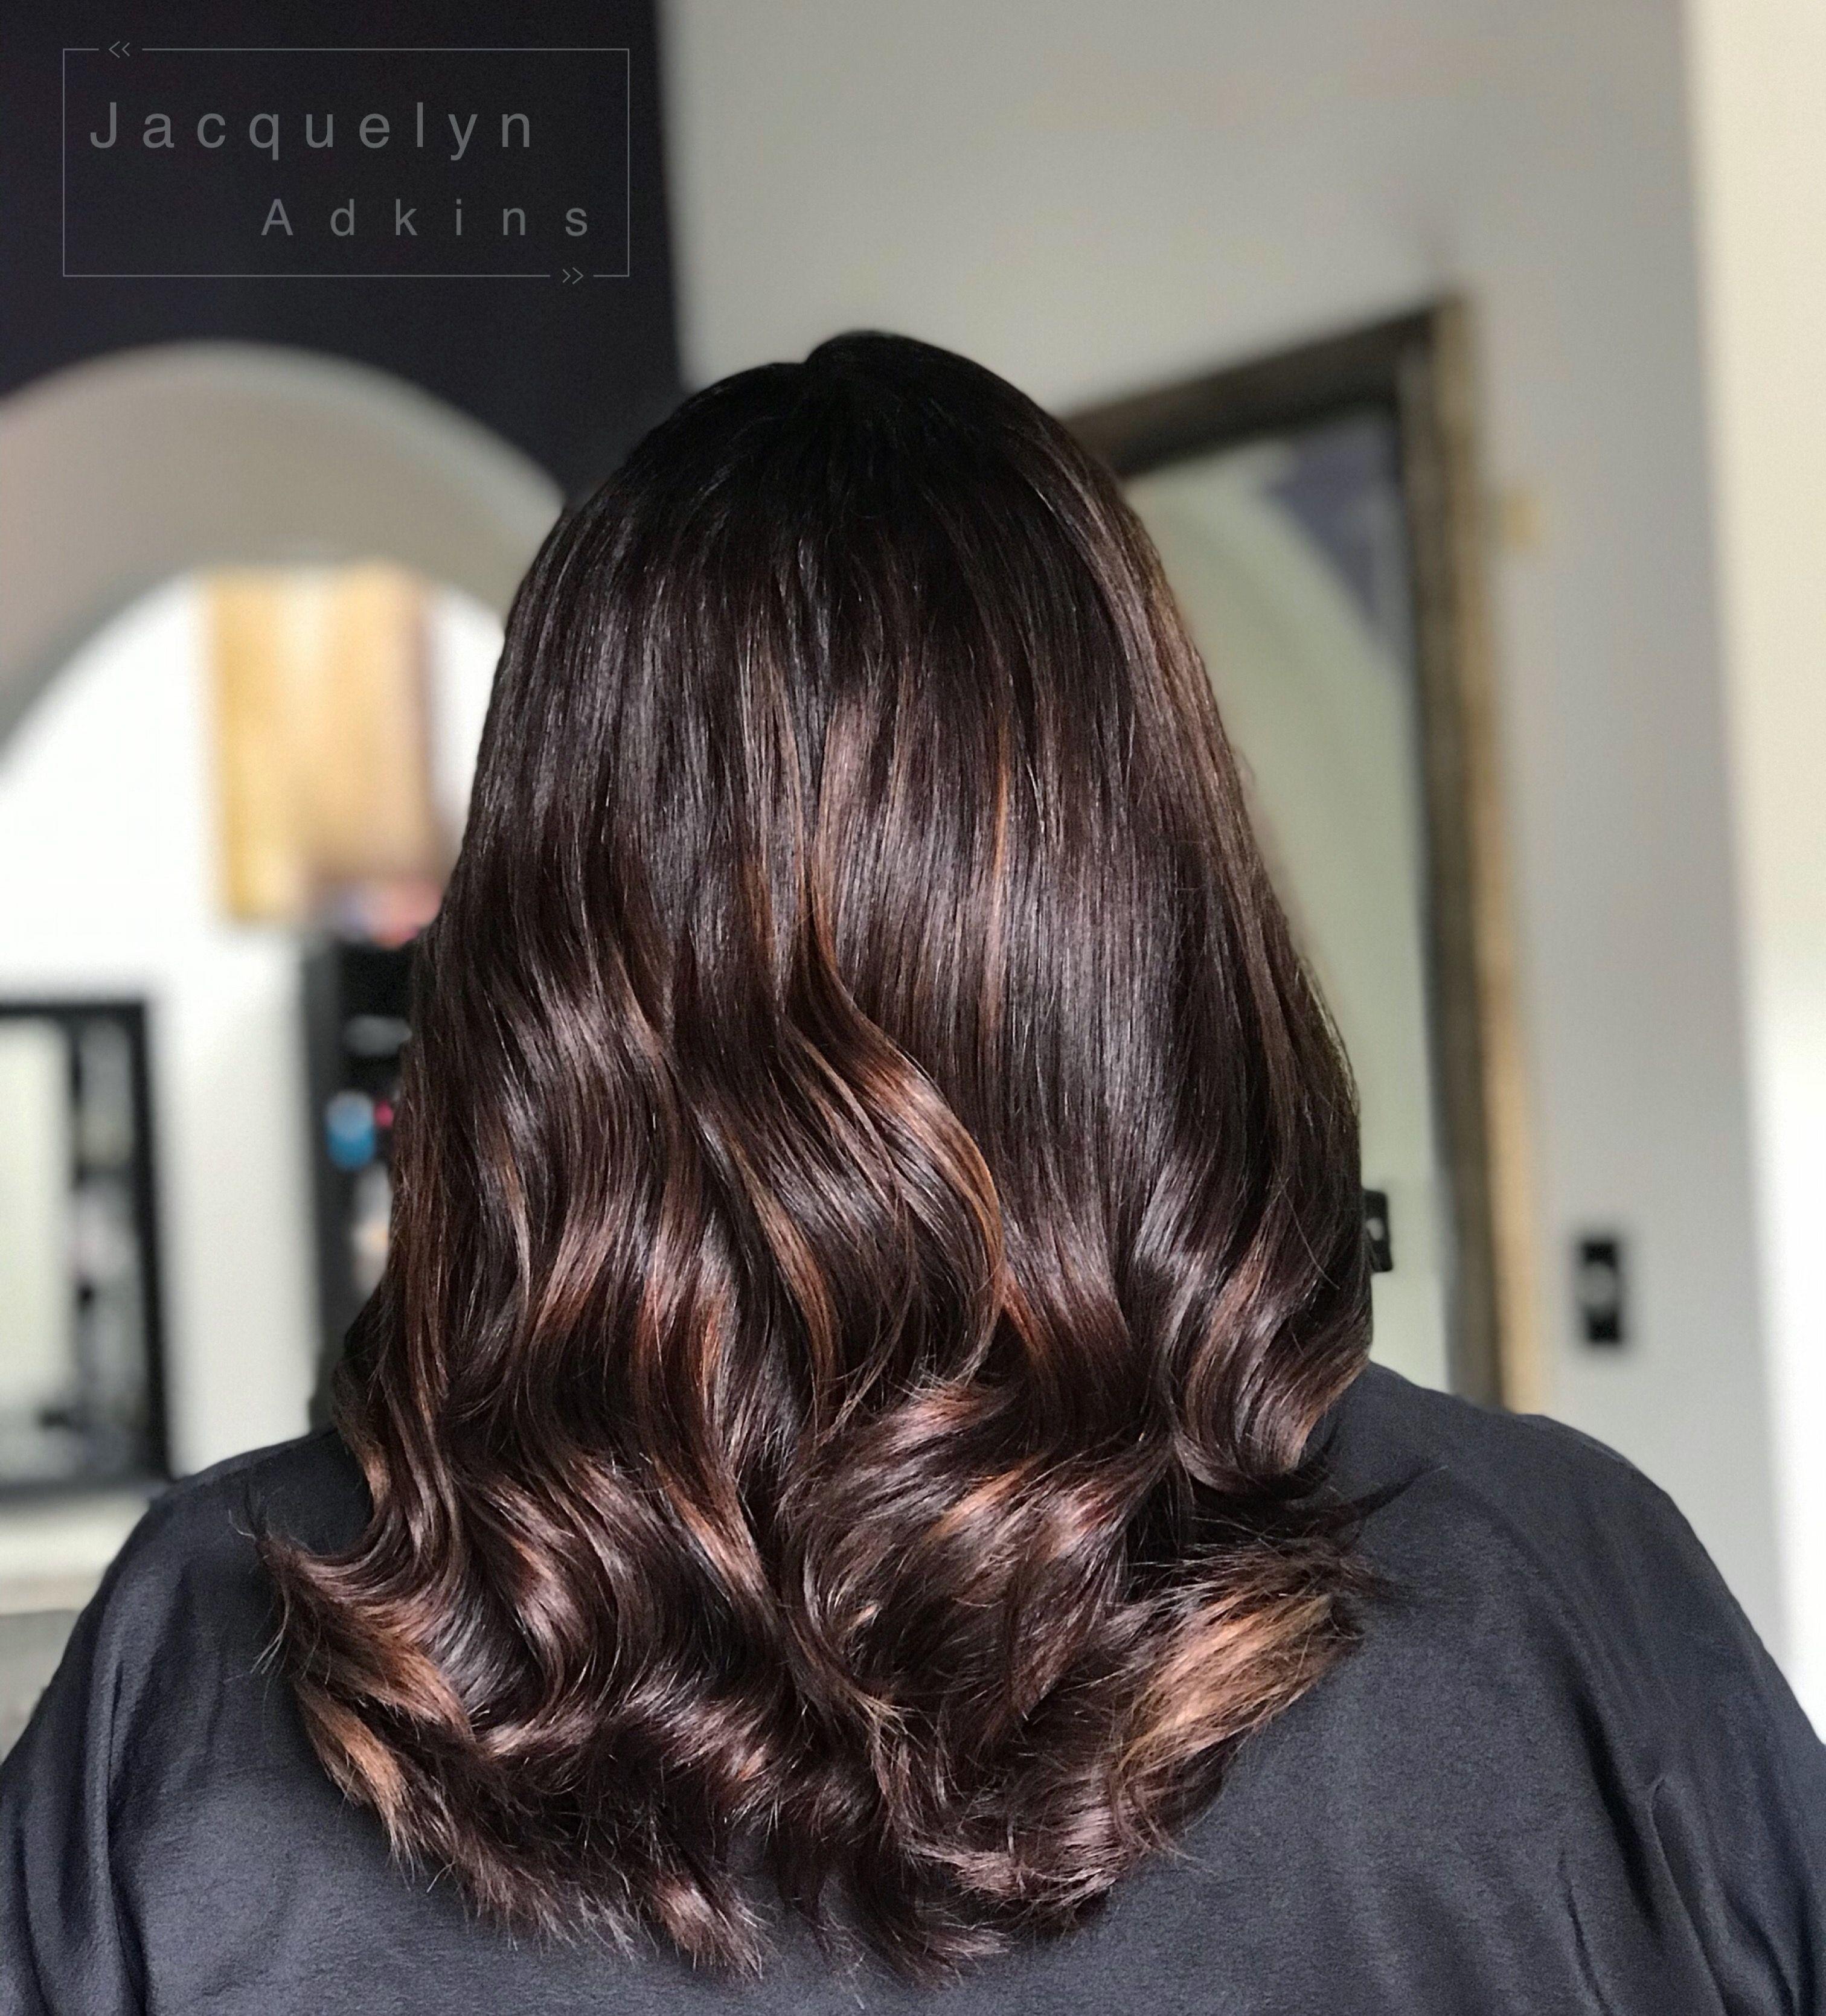 Follow My Instagram Unevneib Caramel Balayage Dark Root Natural Root Short Hair Medium L Hair Color Light Brown Dark Hair With Highlights Curls For Long Hair